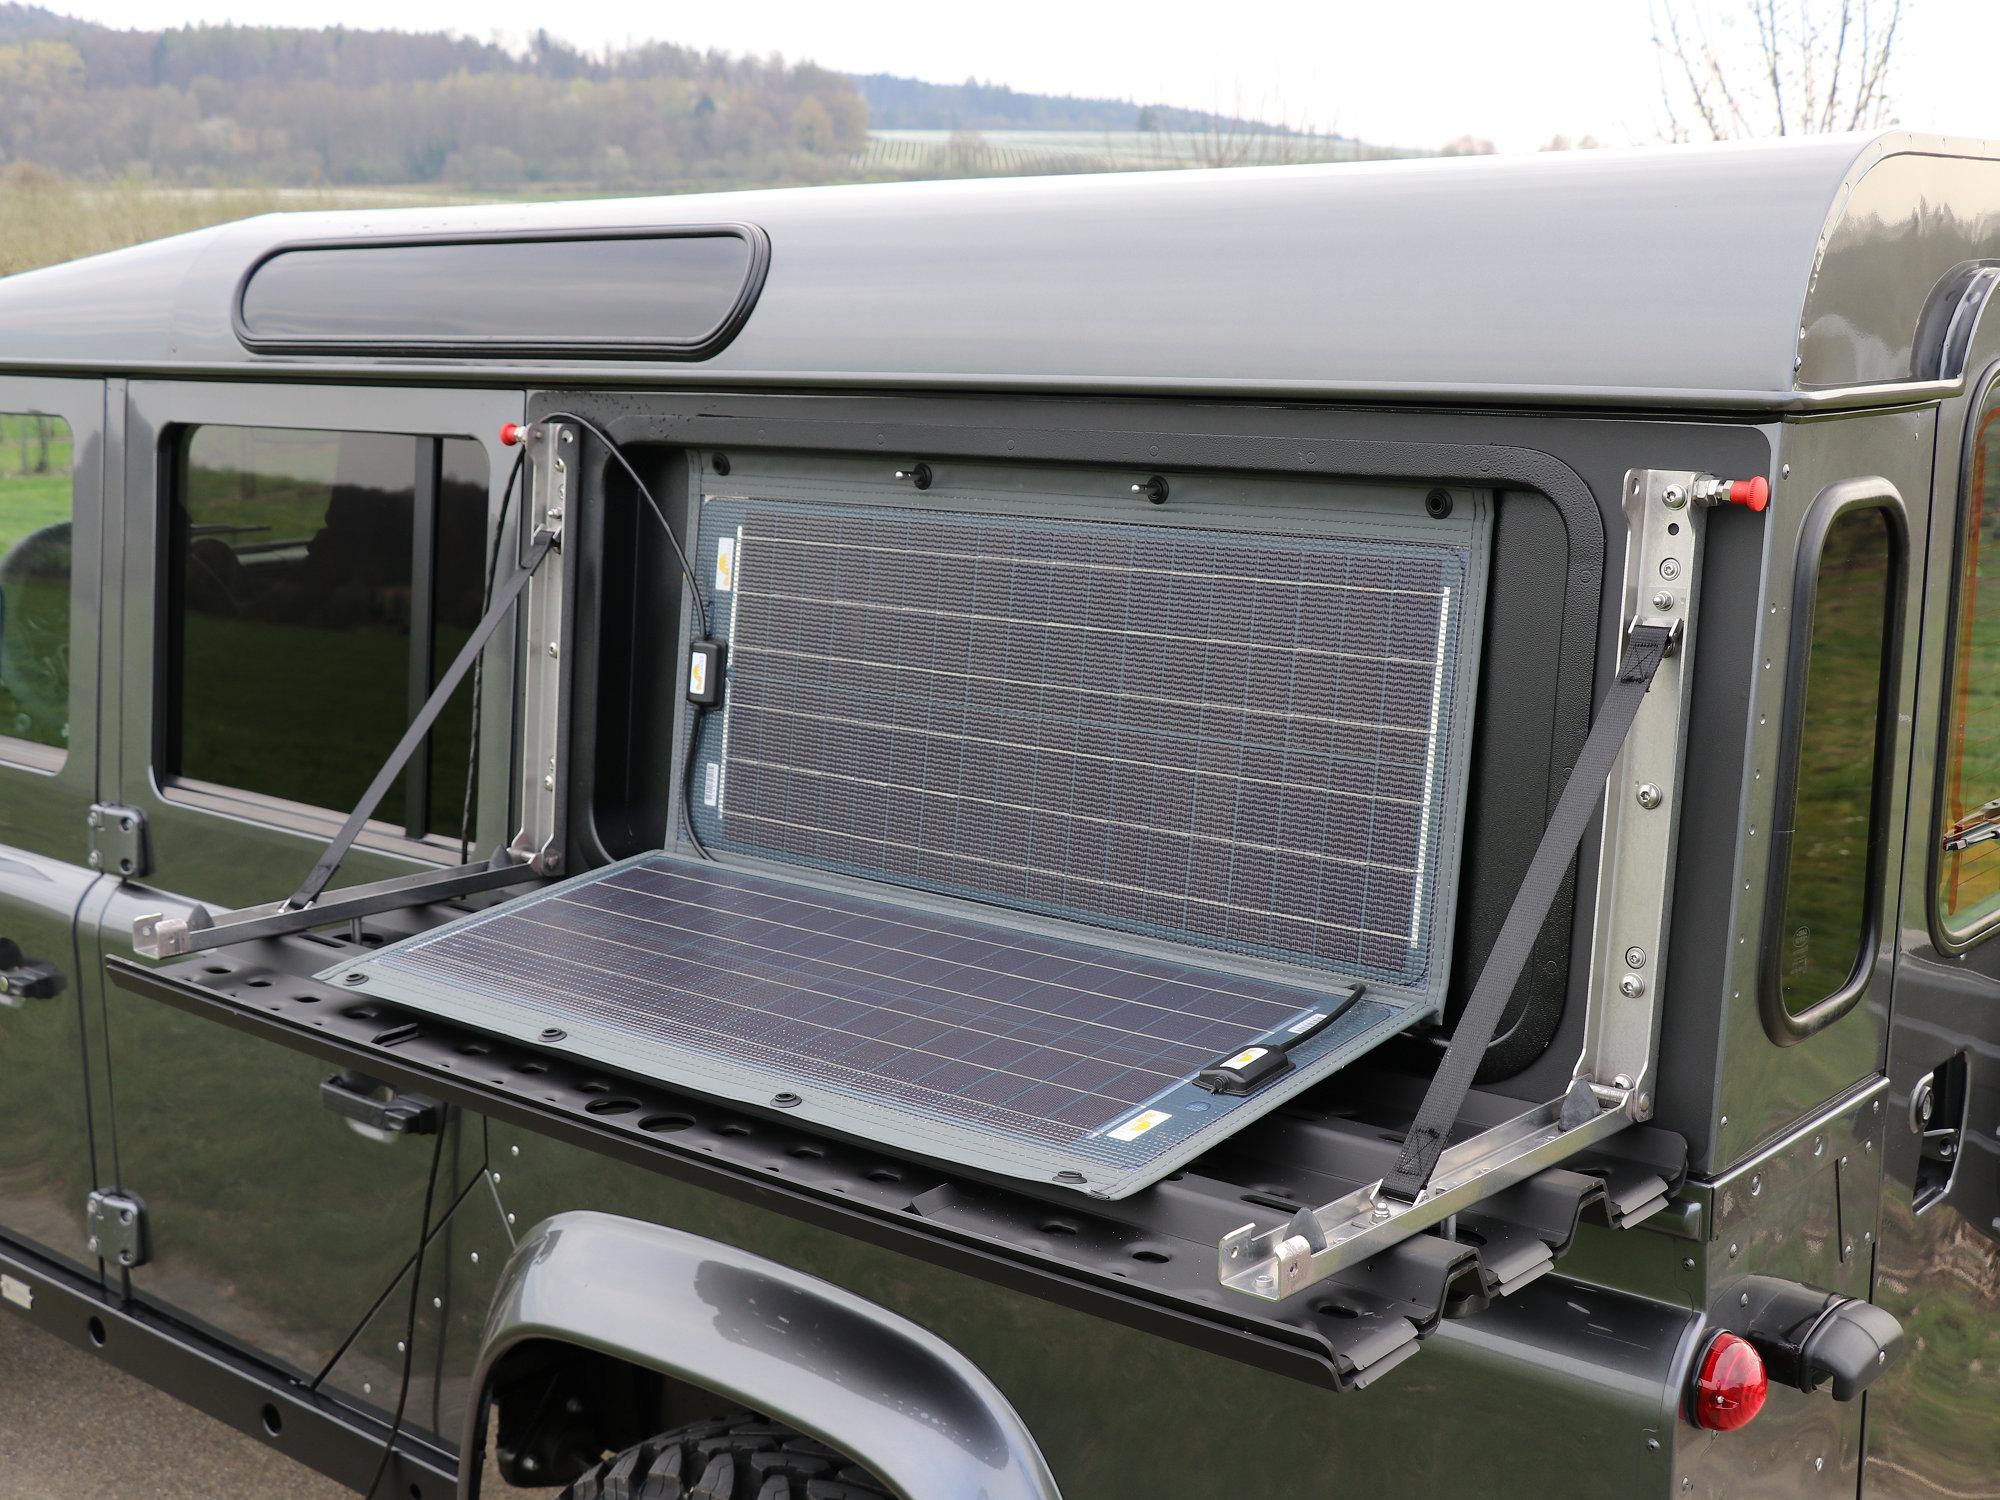 Solarenergie Land Rover Defender.000